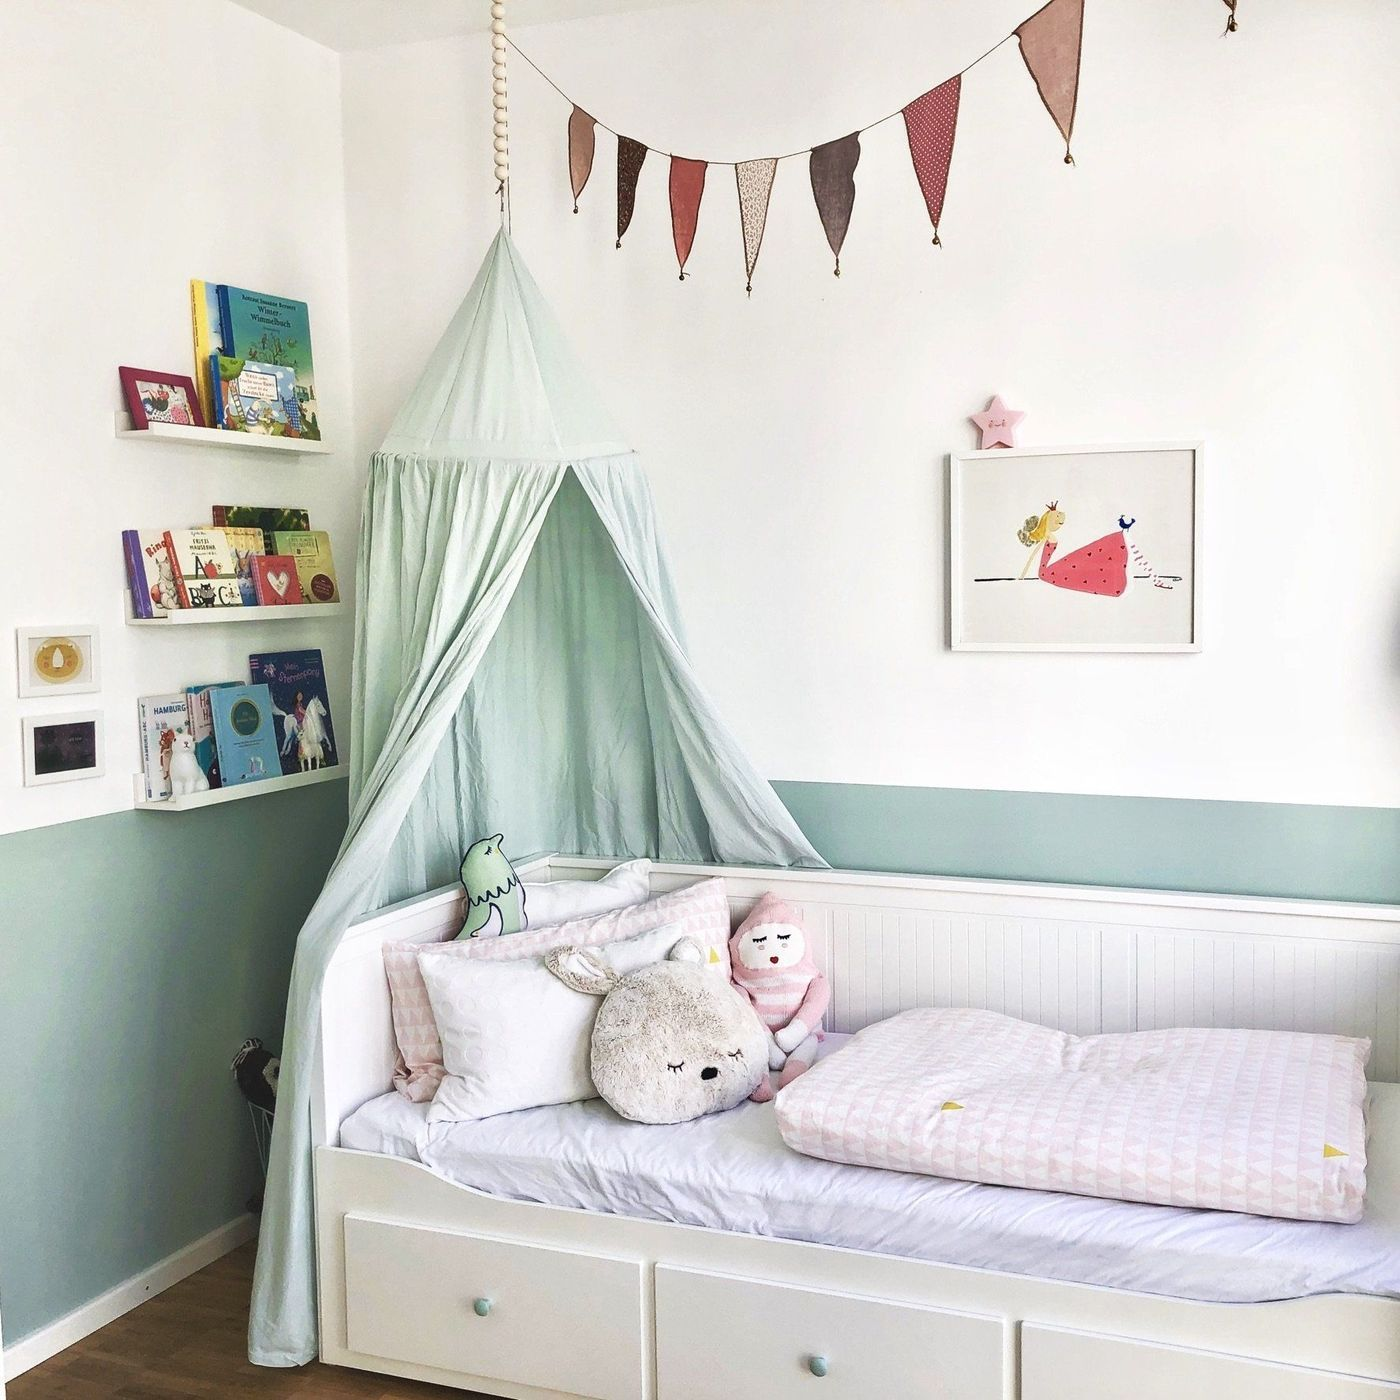 Ikea Hemnes Bett: Ideen & Bilder